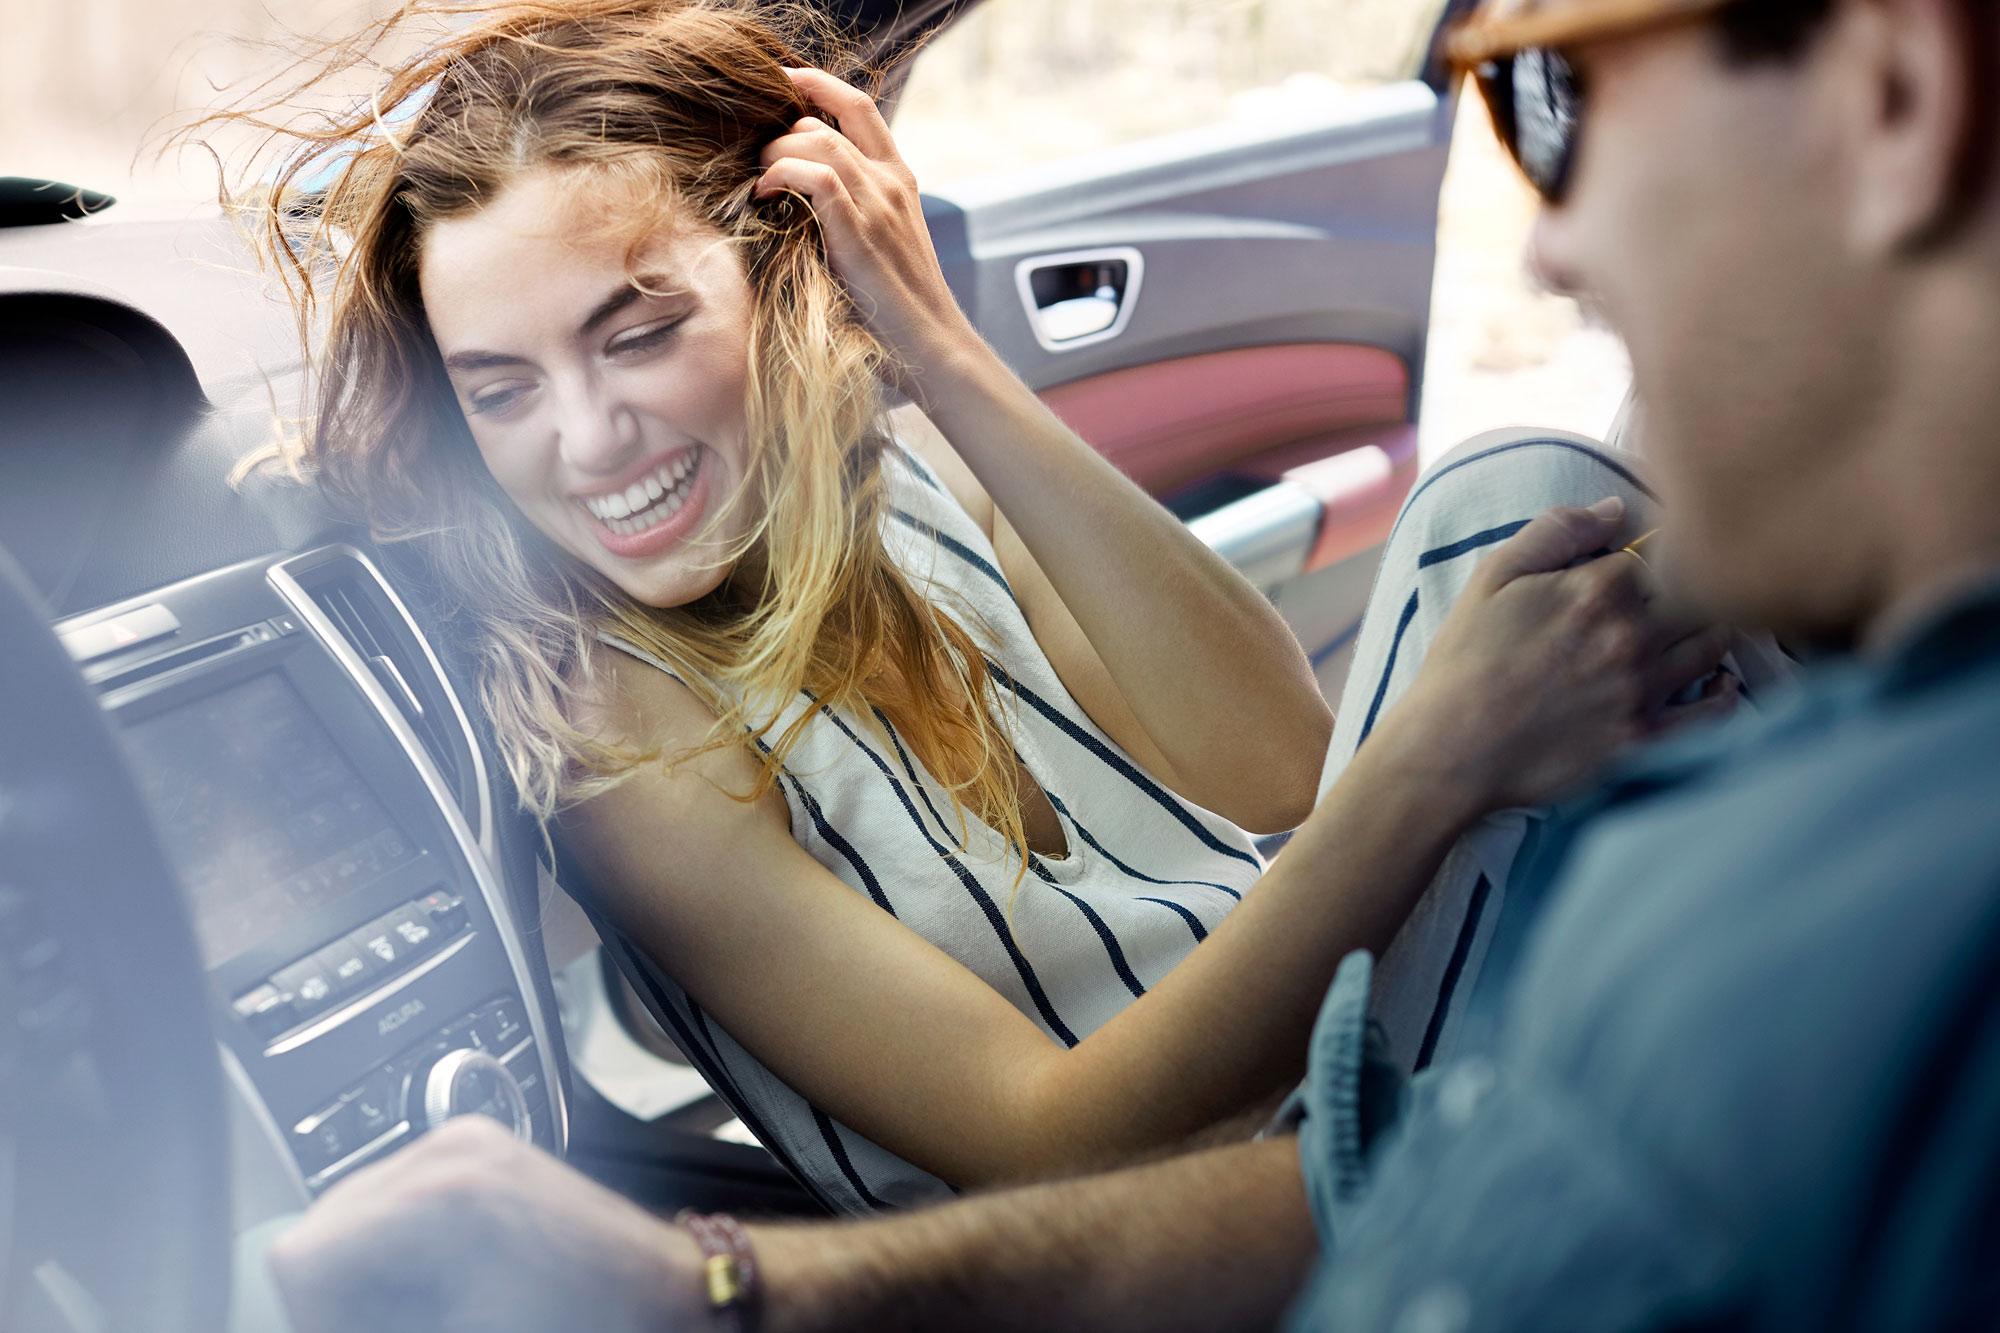 lou-mora-automotive-lifestyle-acura-202.jpg